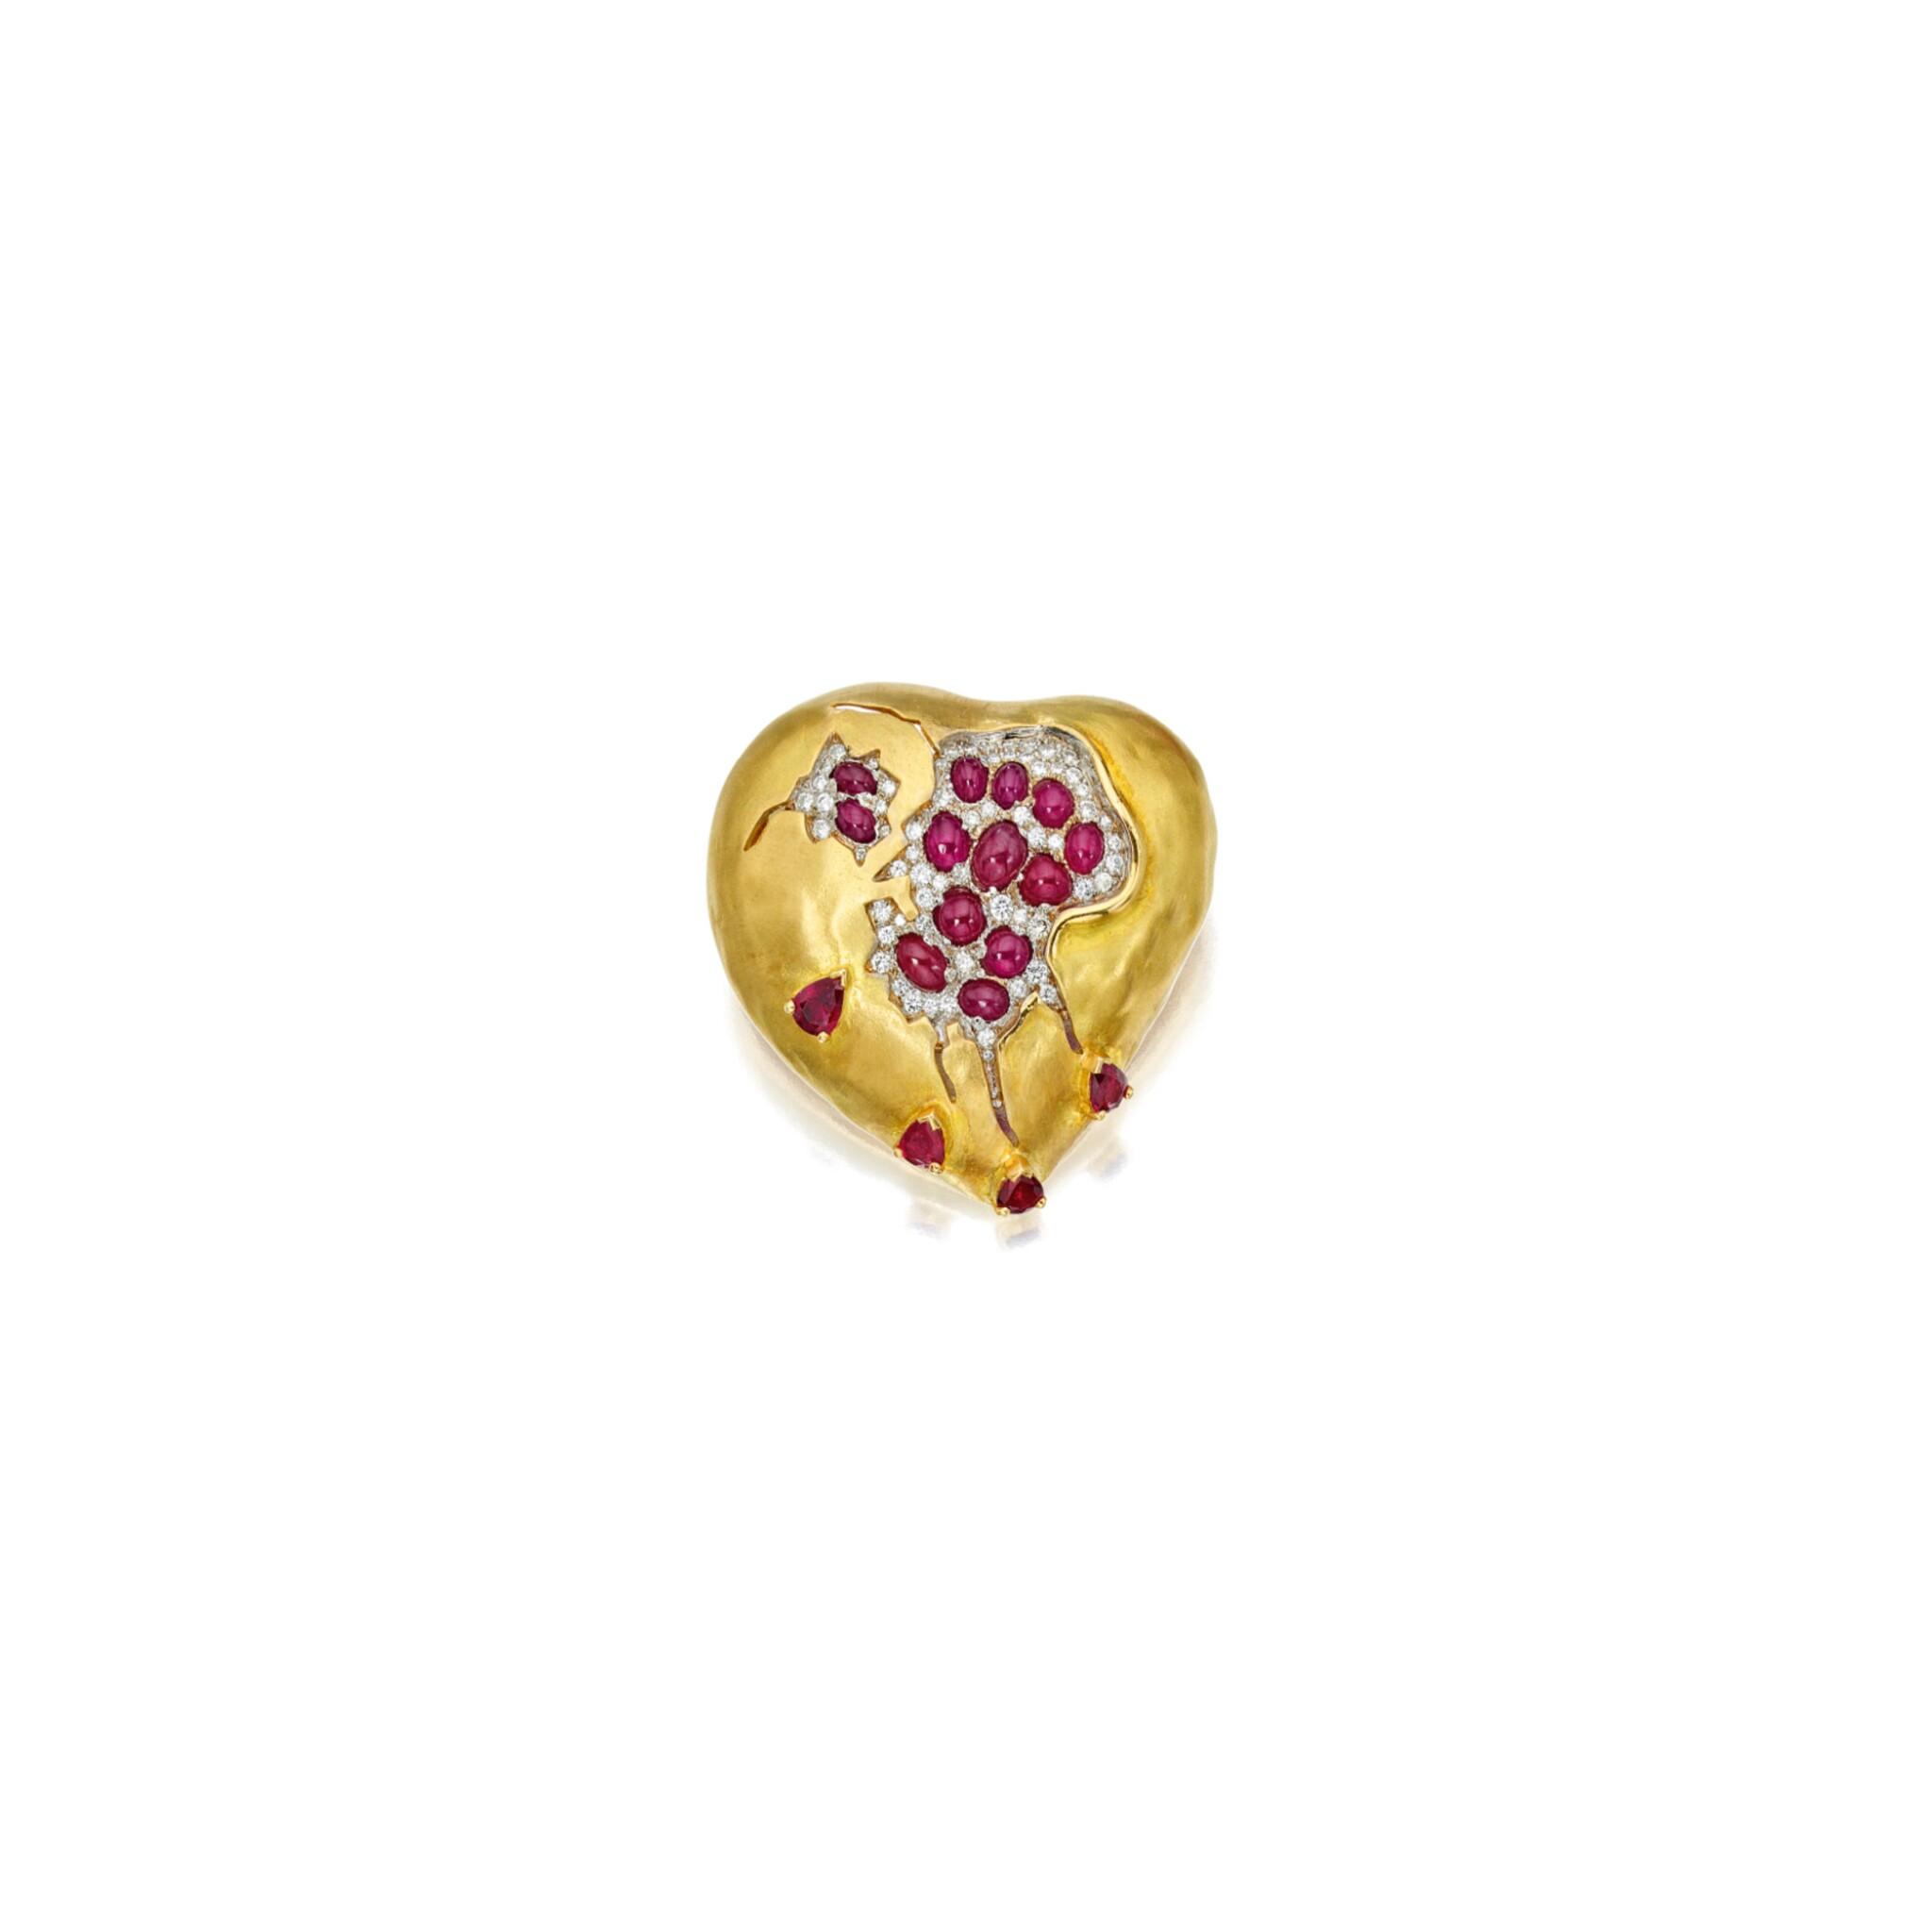 View full screen - View 1 of Lot 529. GOLD, RUBY AND DIAMOND 'POMEGRANATE HEART' BROOCH, HENRYK KASTON FOR SALVADOR DALÍ | 黃金鑲紅寶石配鑽石「紅石榴之心」別針,Henryk Kaston為薩爾瓦多・達利製造.